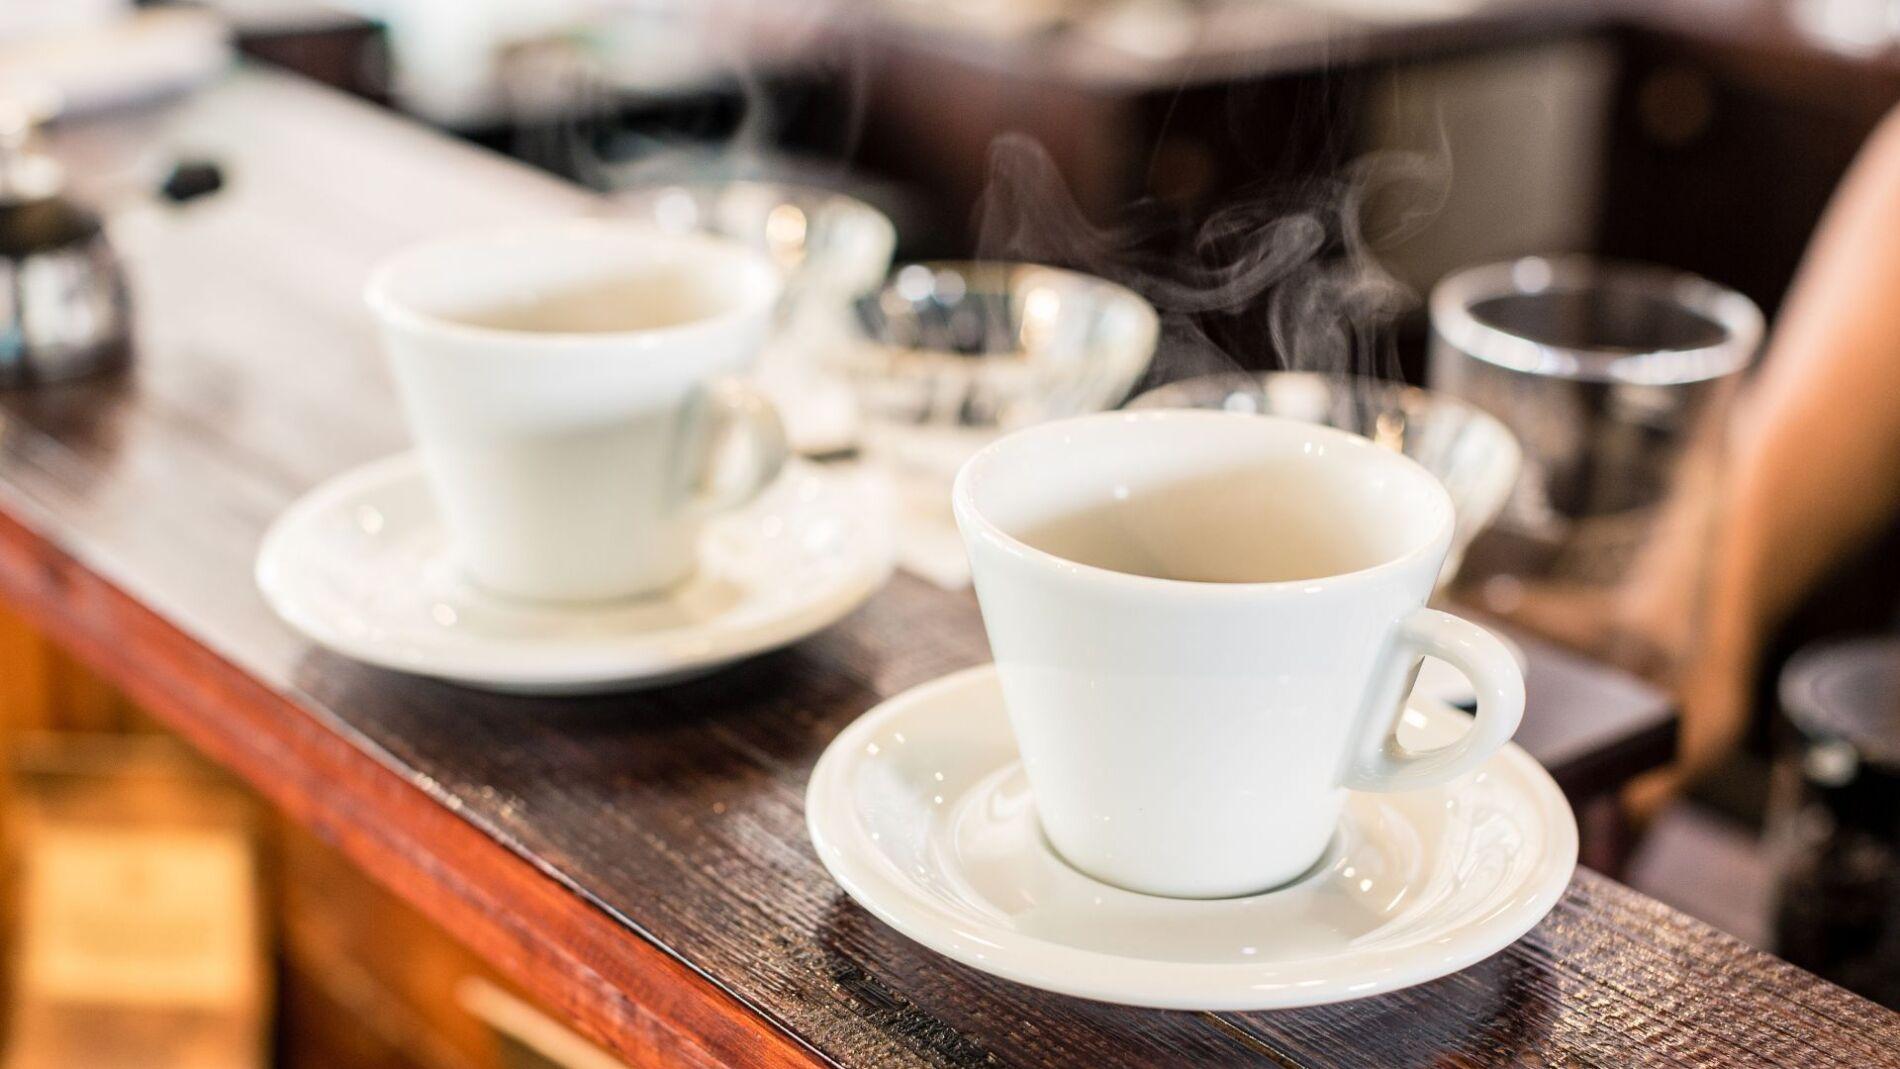 Coffee on the bar at a Narragansett breakfast restaurant